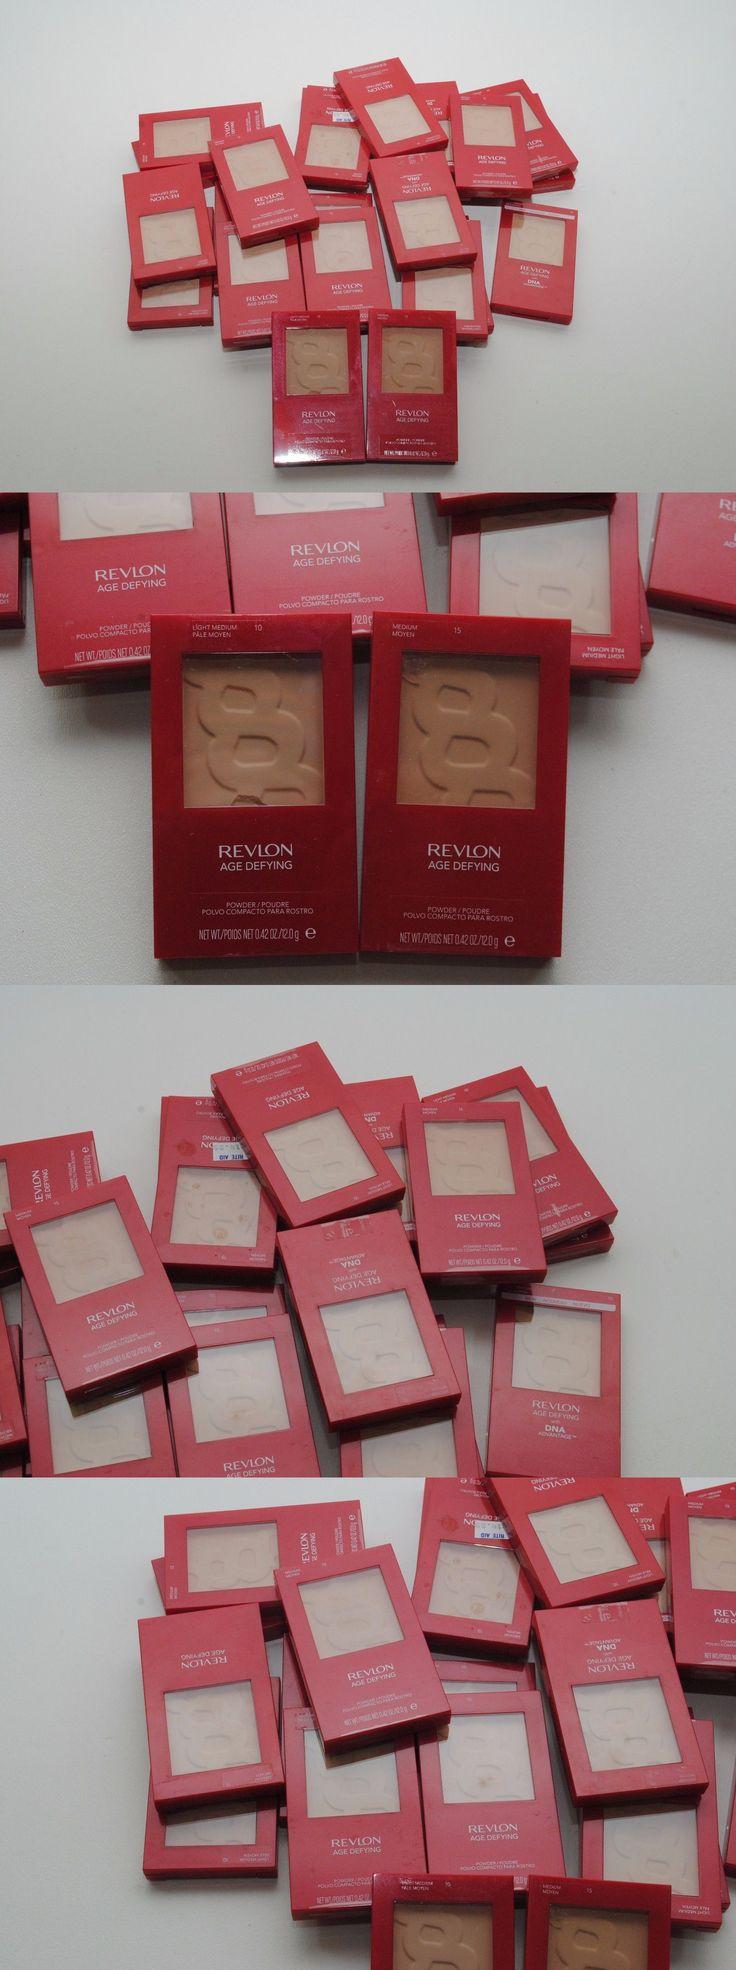 wholesale Makeup: 23X Wholesale Lot Revlon Age Defying Powder -Mix Colors- -> BUY IT NOW ONLY: $31.27 on eBay!